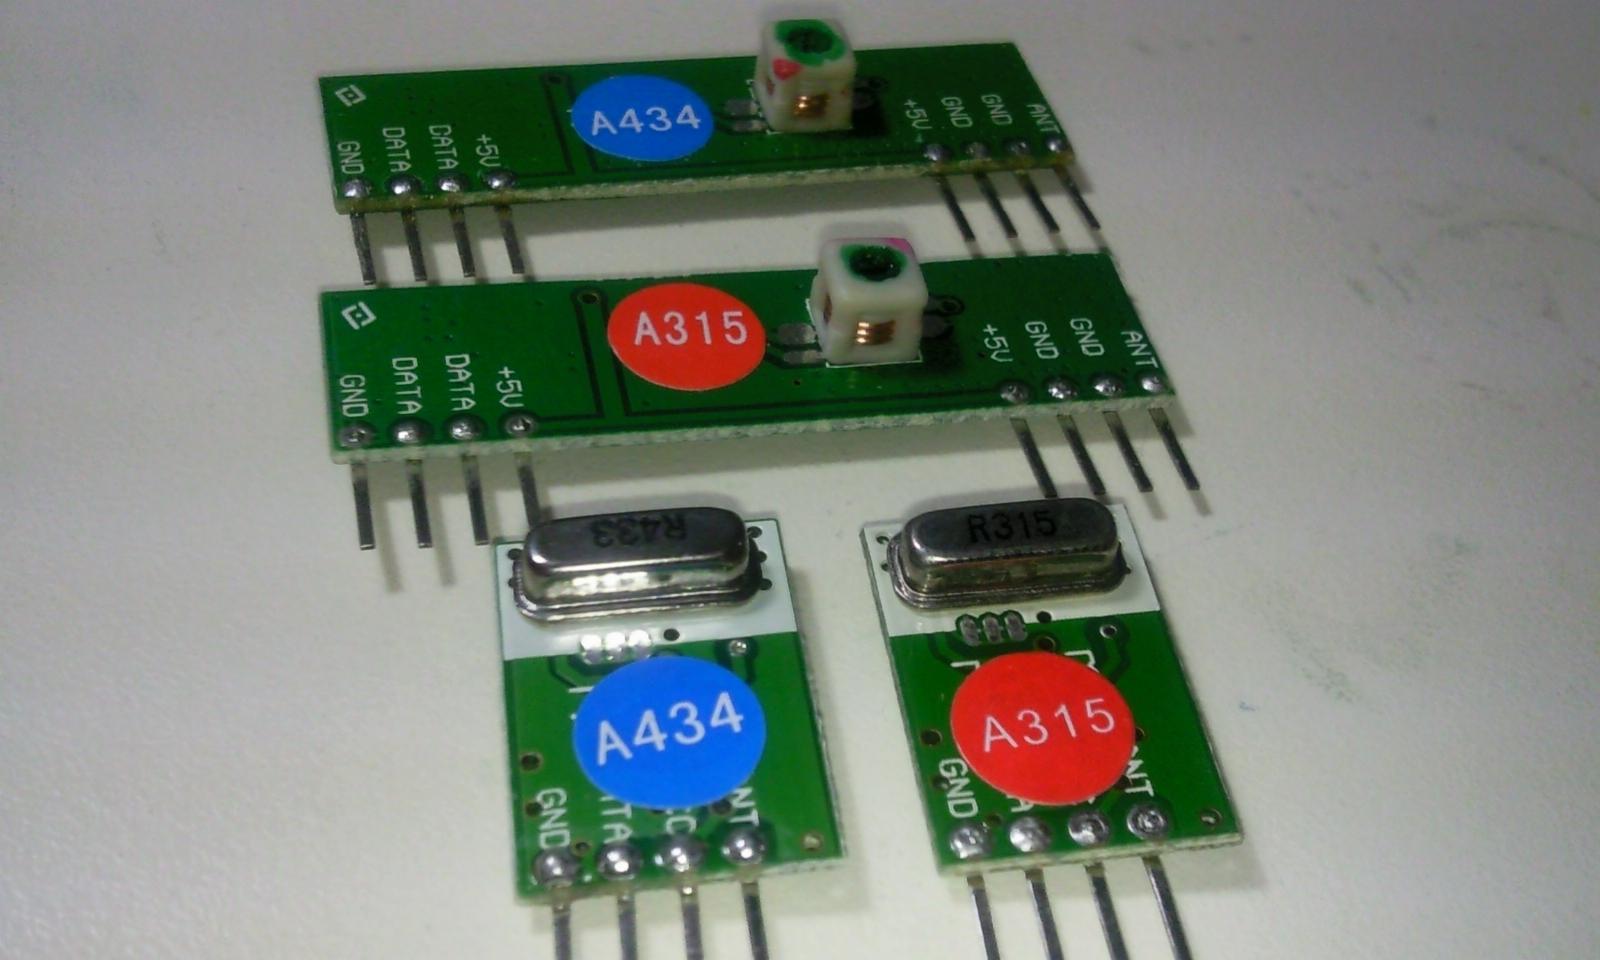 RF 434MHz ASK Transmitter and Receiver arduinolabnet